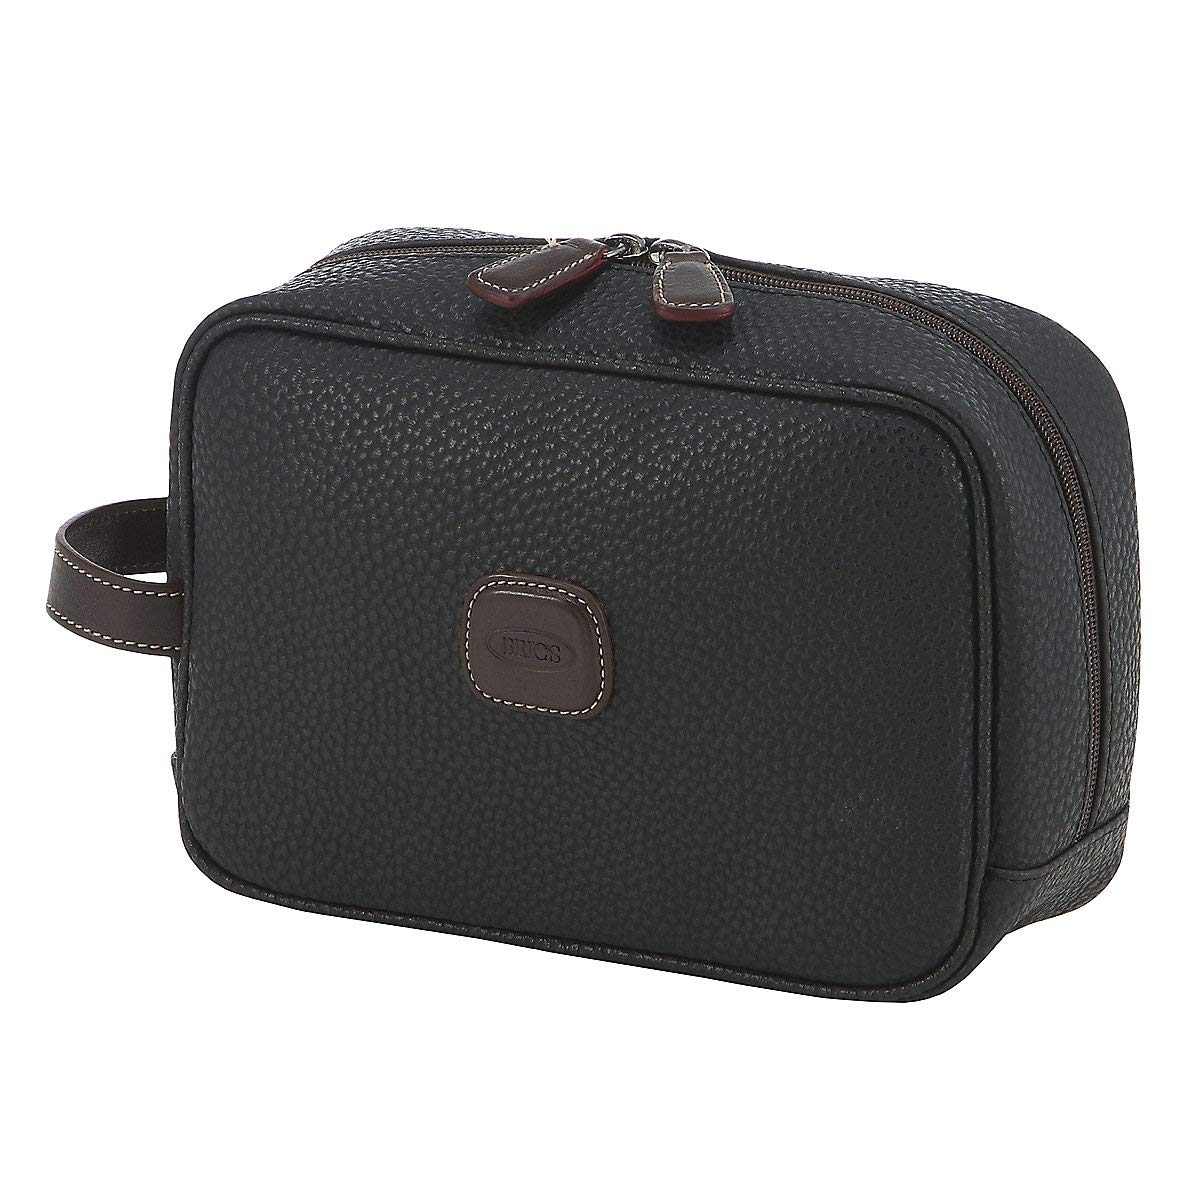 B00EE7XQOW Bric's Magellano Traditional Shave Case (One Size, Black) 71D7KPnIWjL._SL1200_